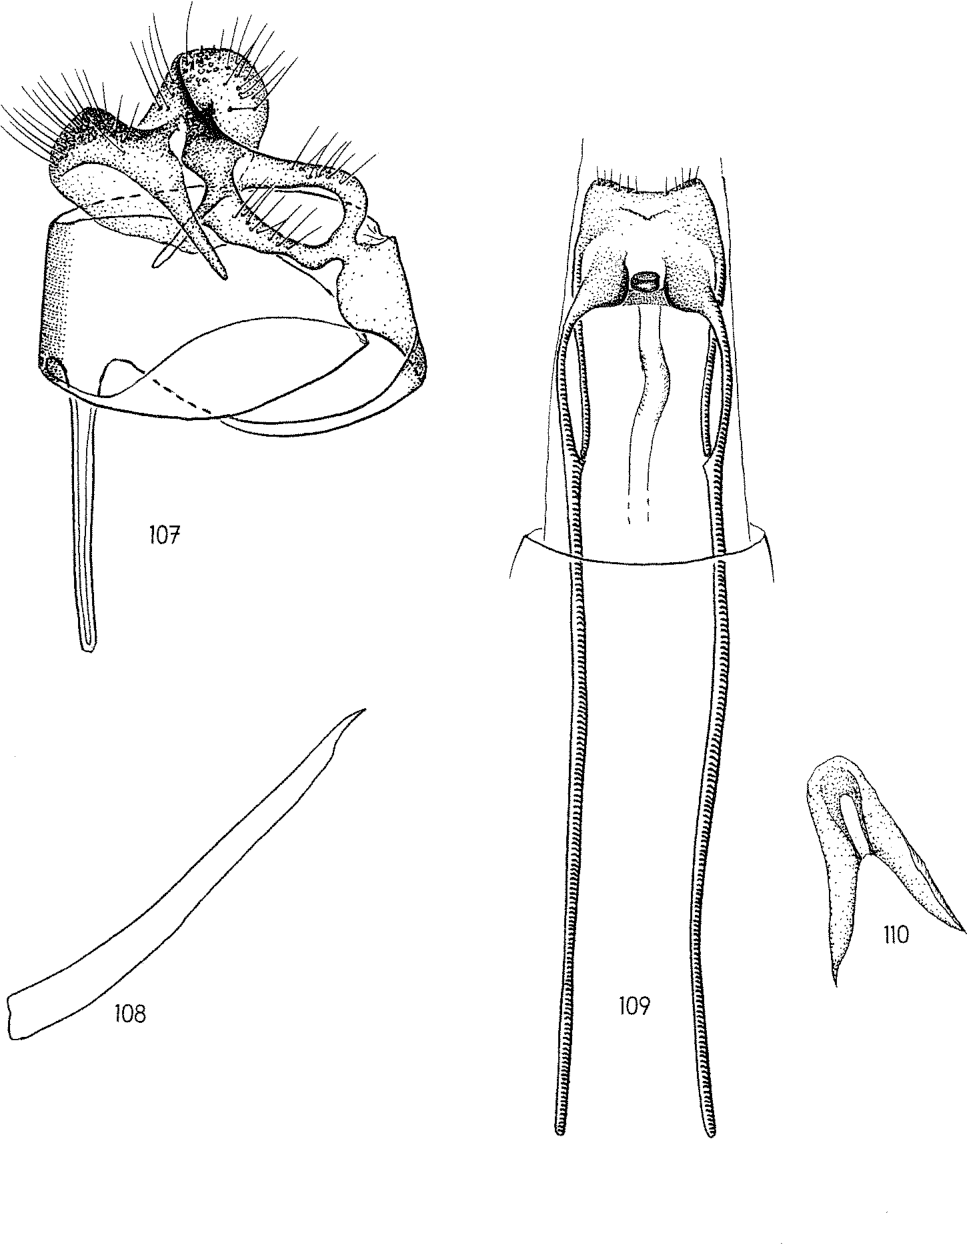 figure 107-110